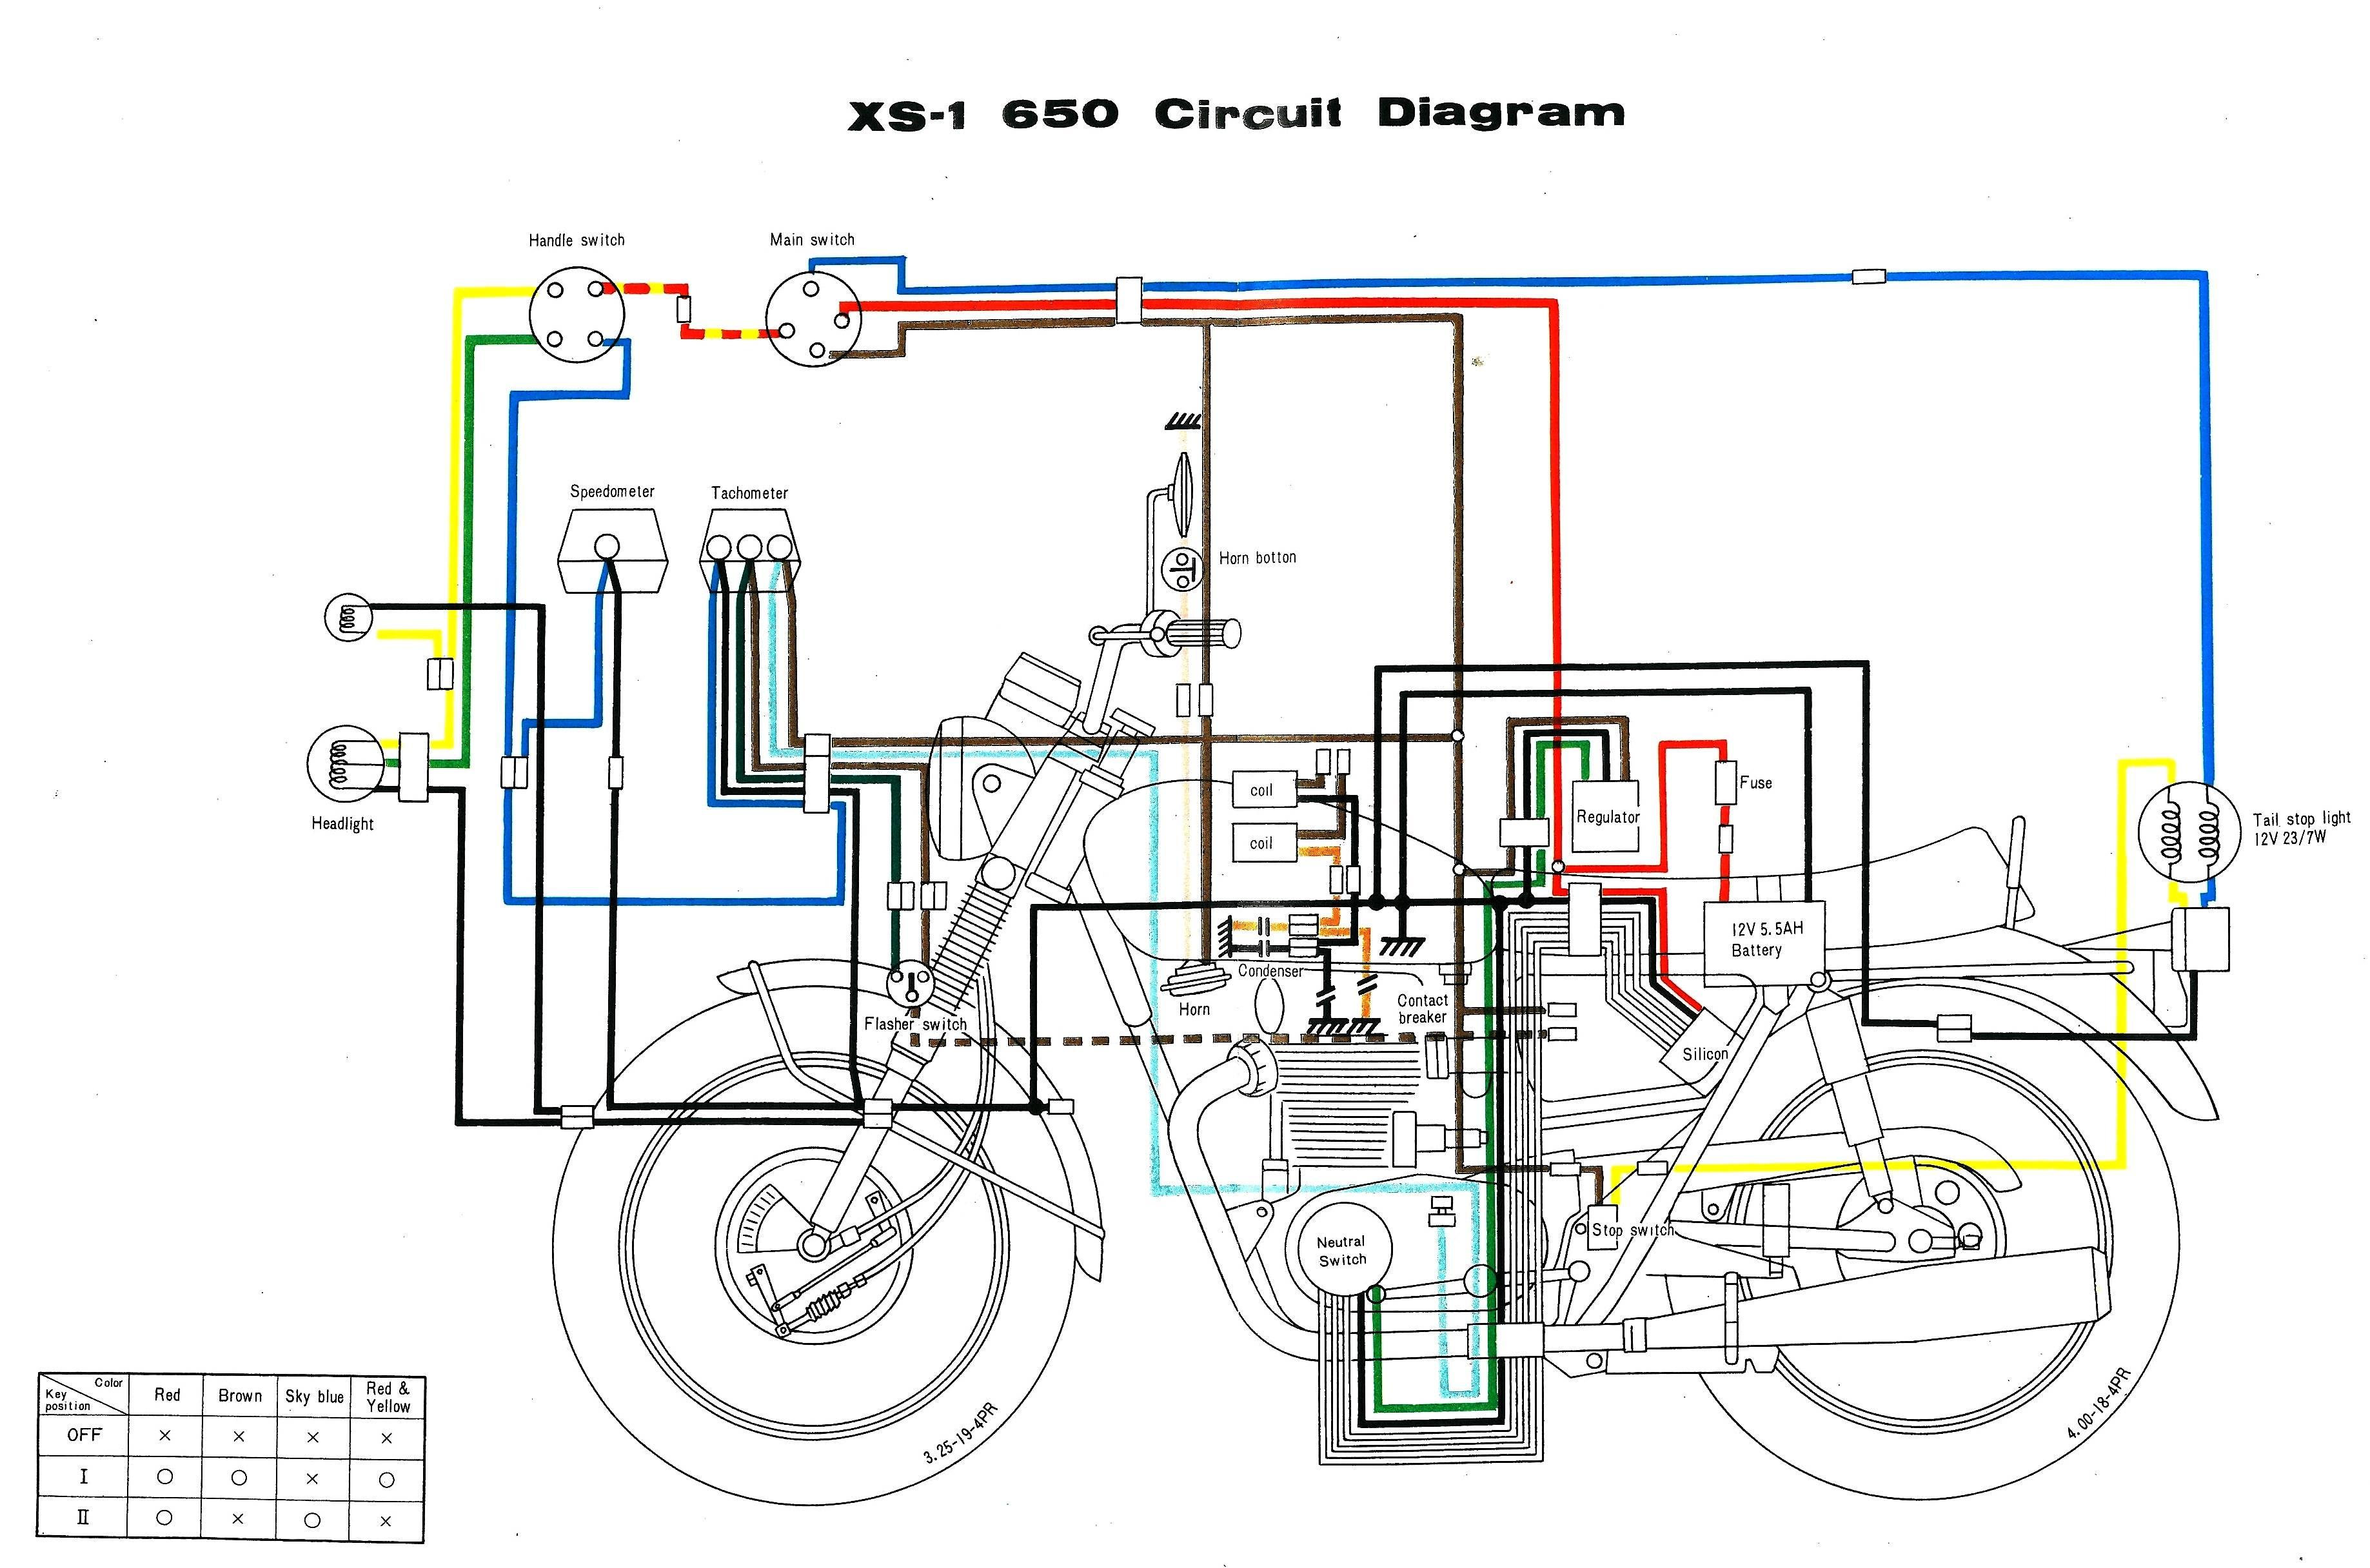 Electrical Wiring Diagram Software | Manual E-Books - Wiring Diagram Software